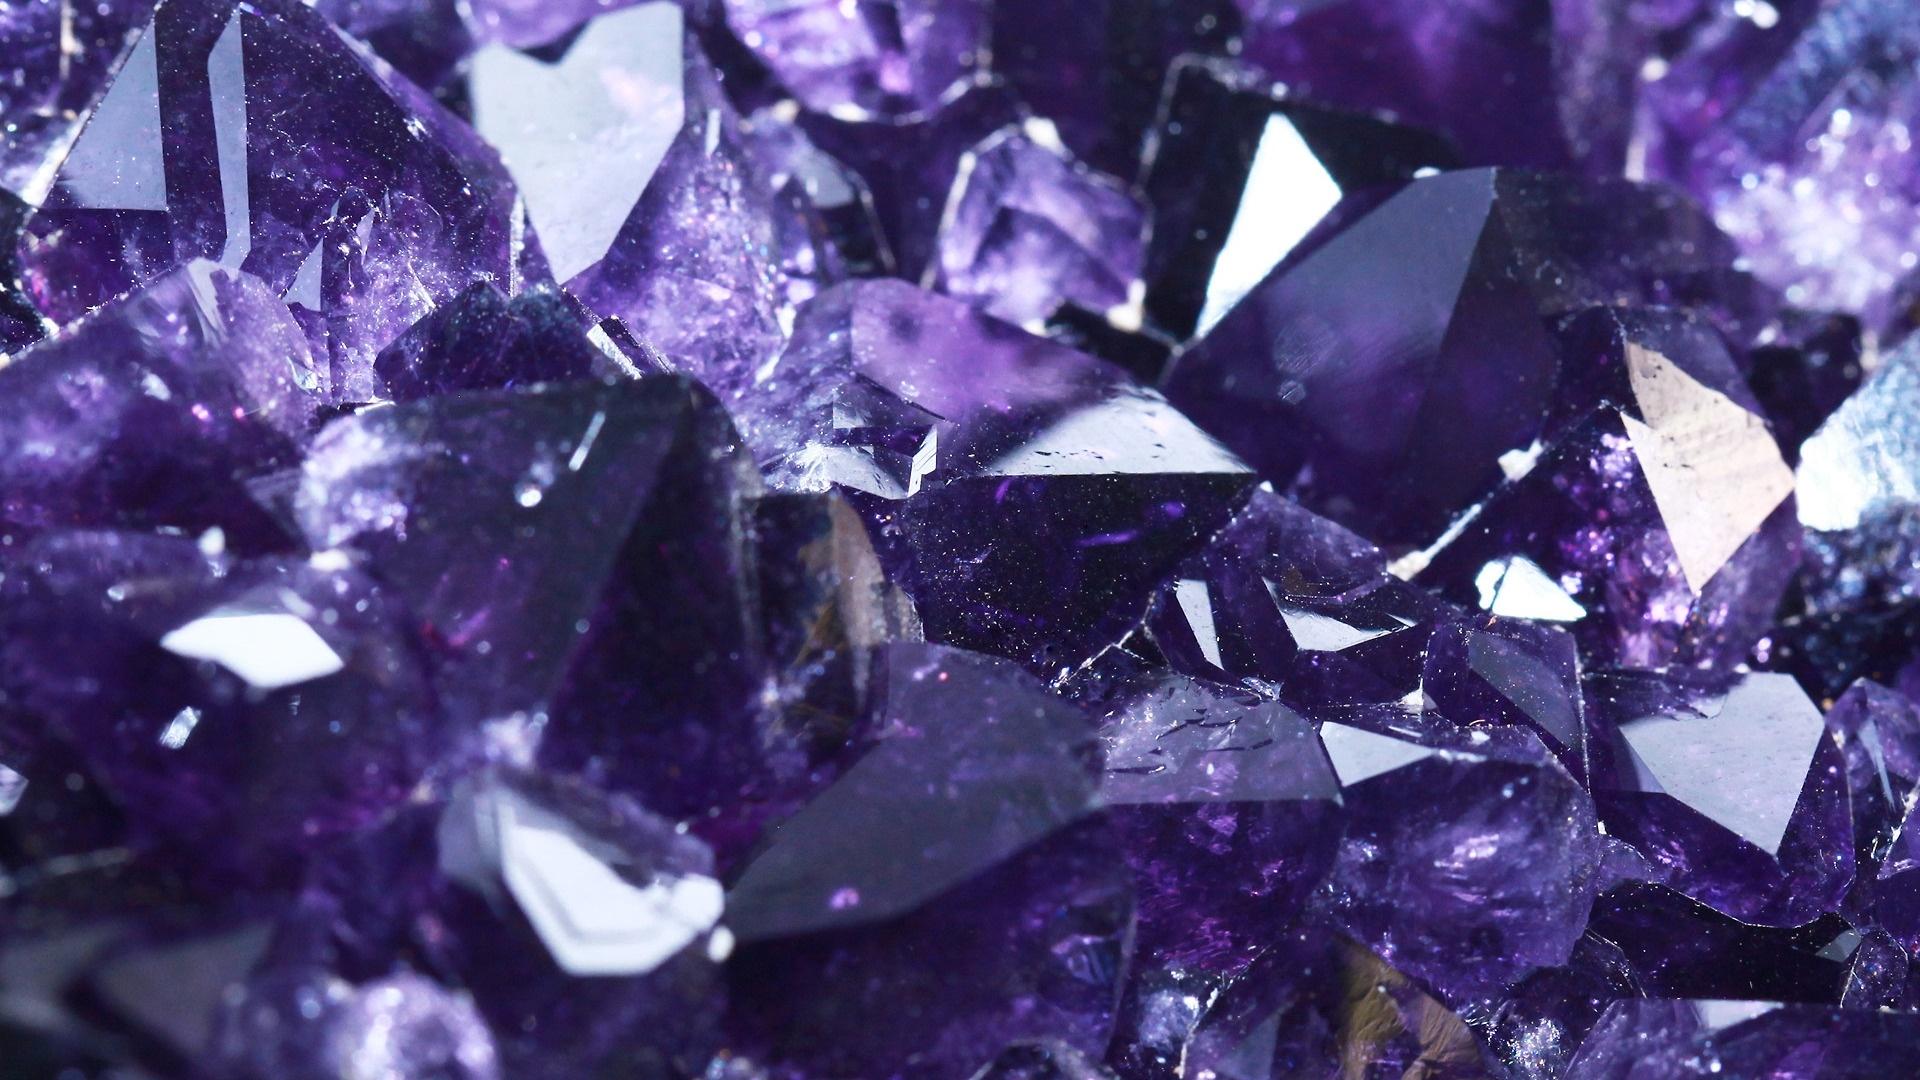 Crystals wallpaper for desktop